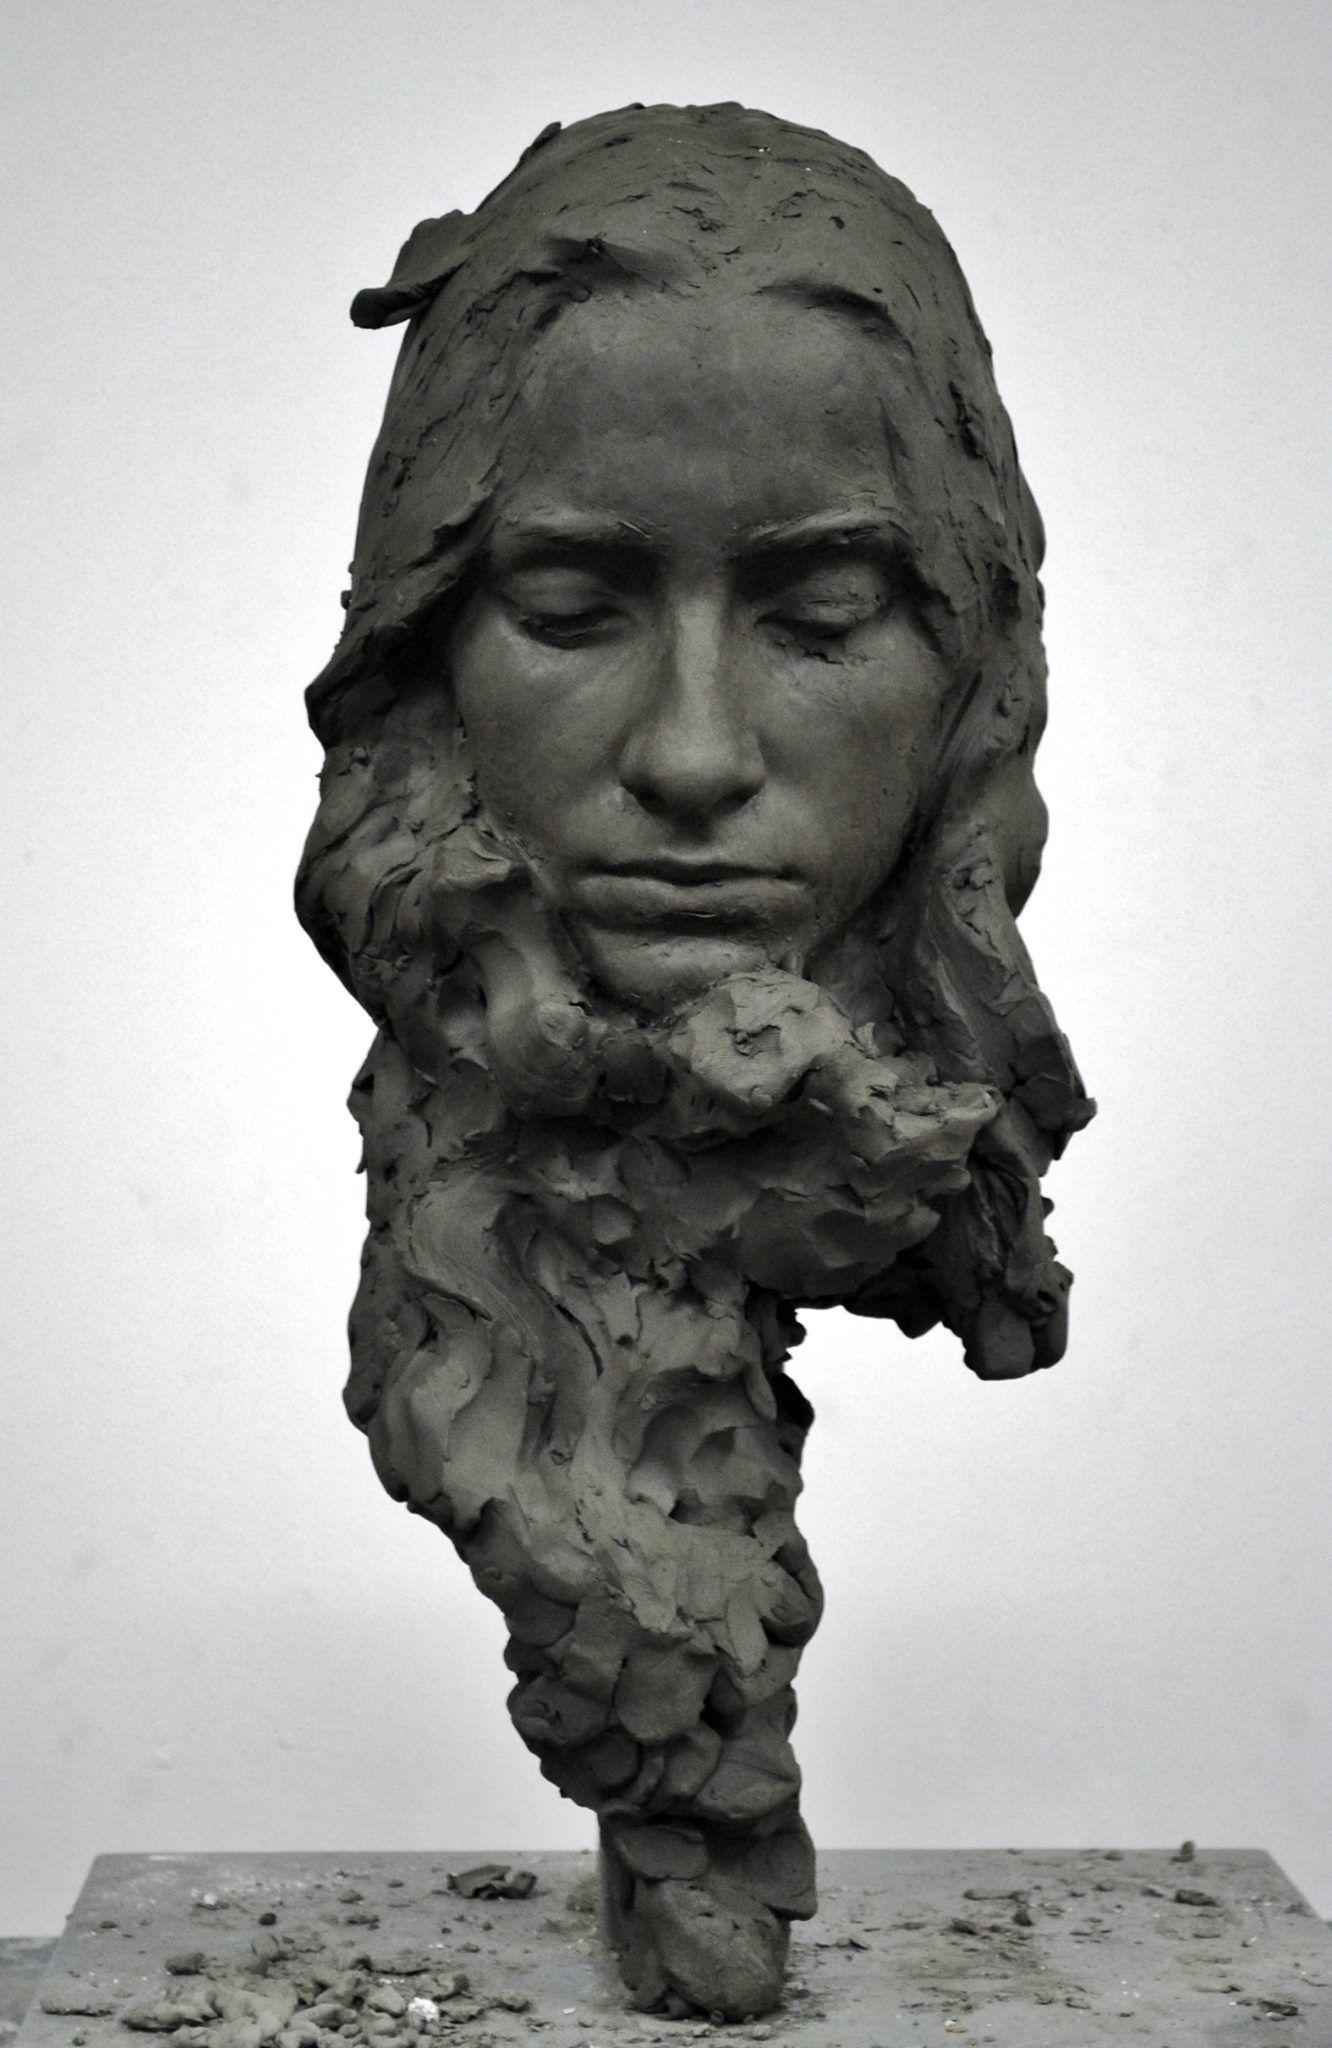 Eudald de Juana Gorriz